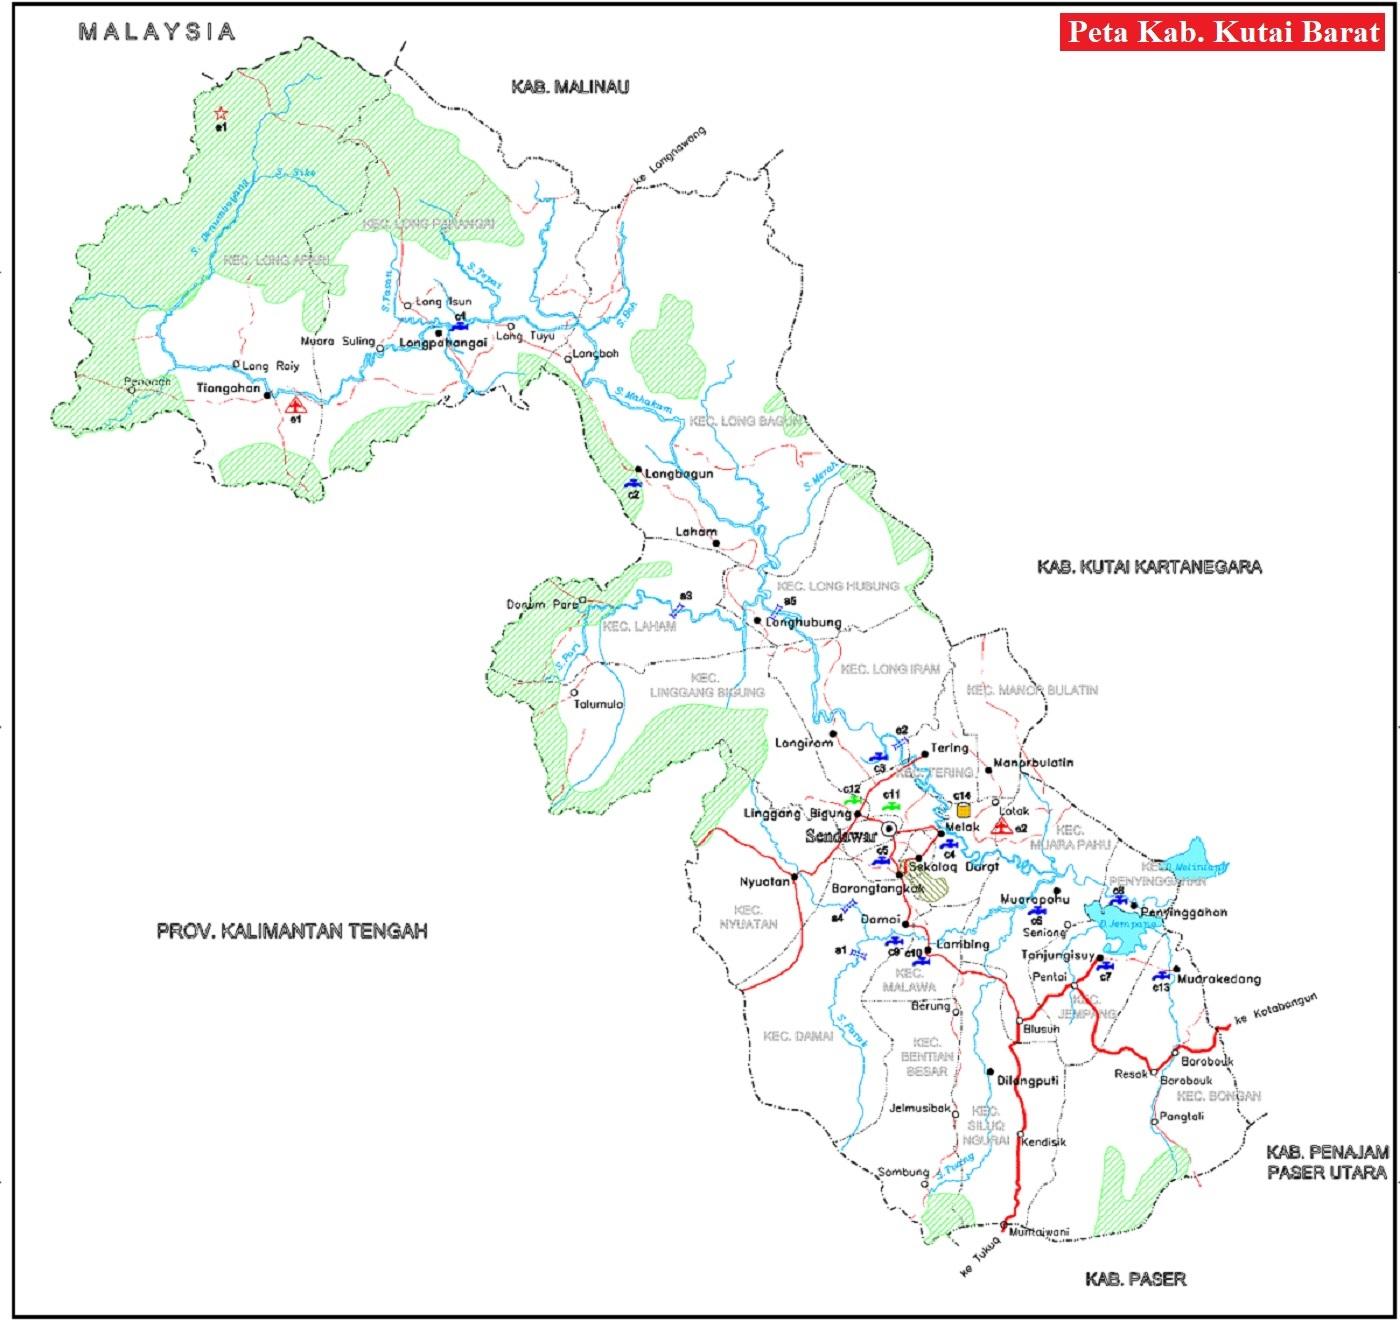 Peta Kabupaten Kutai Barat HD Lengkap